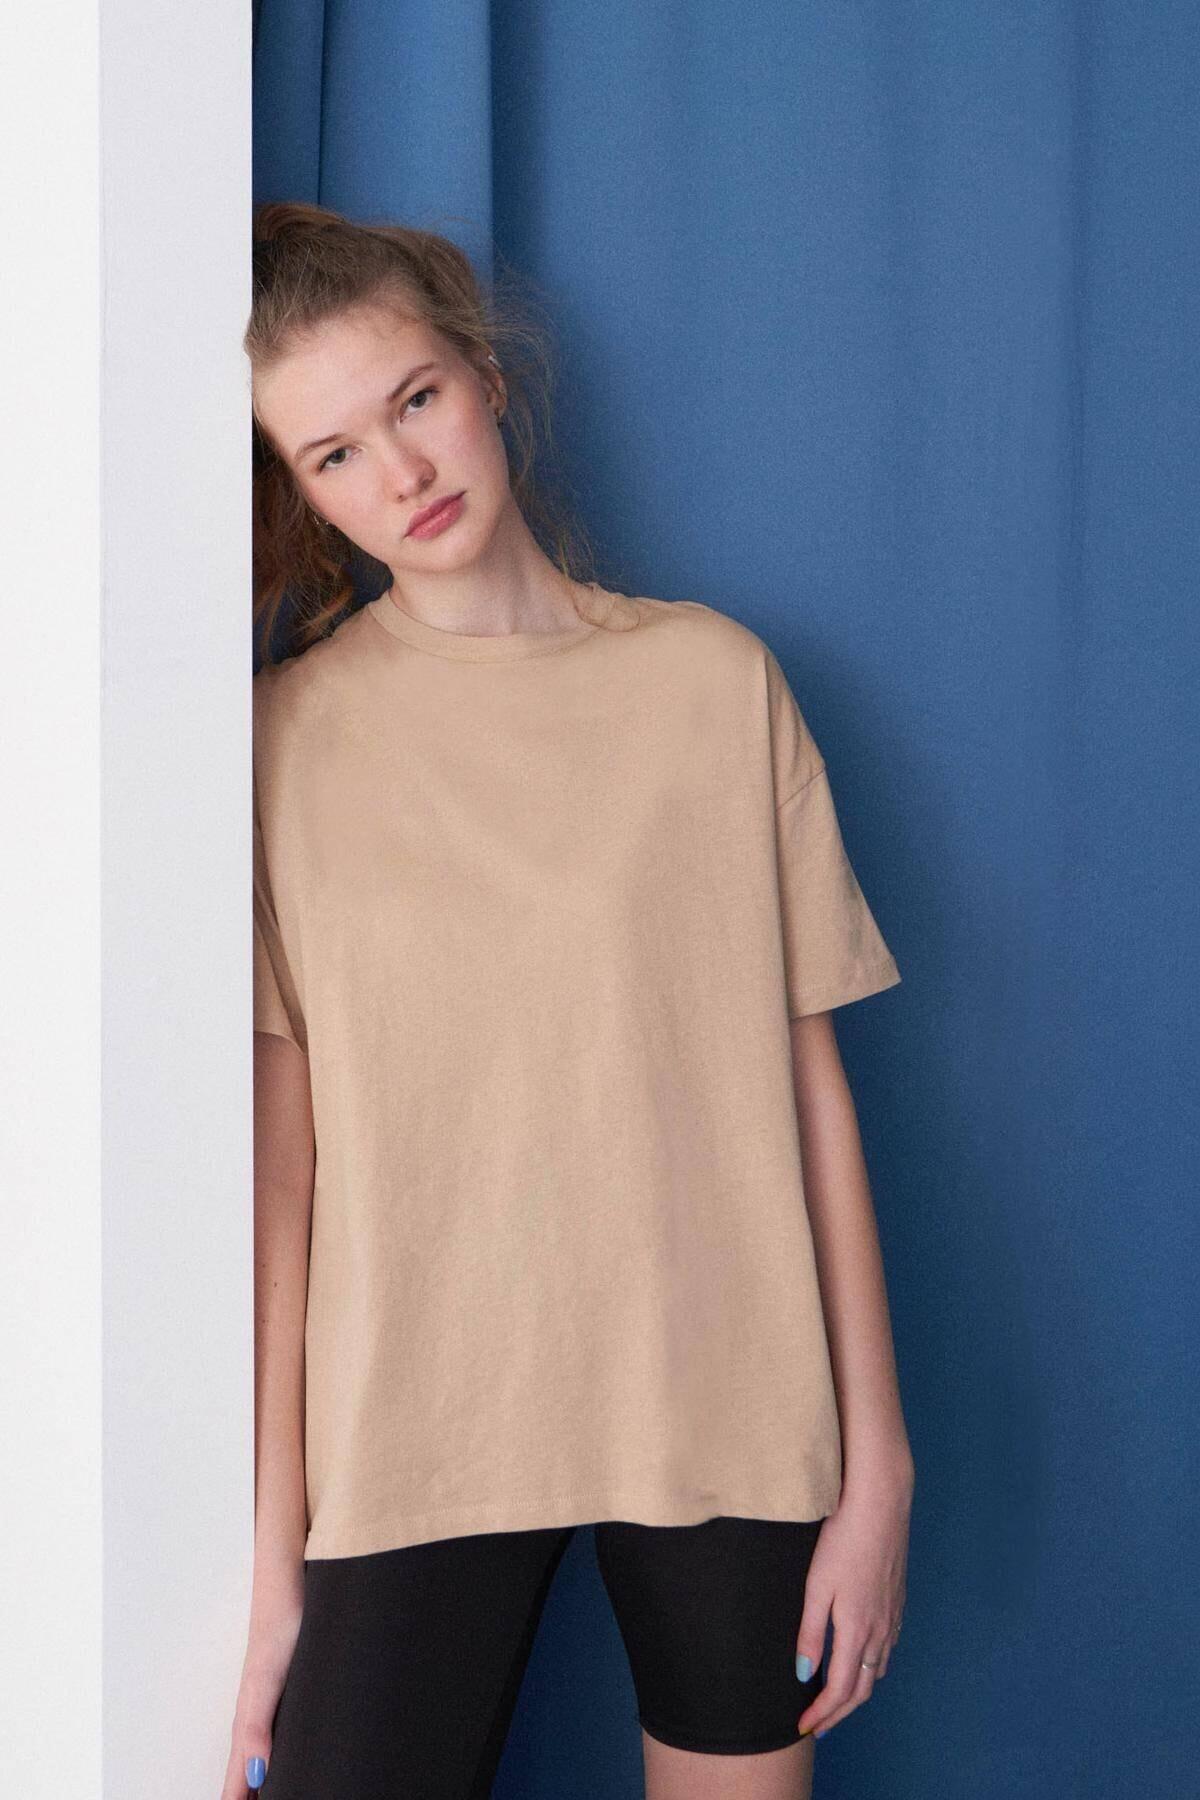 Addax Kadın Sütlü Kahve Fermuar Detaylı T-Shirt P6386 - I8 Adx-0000023895